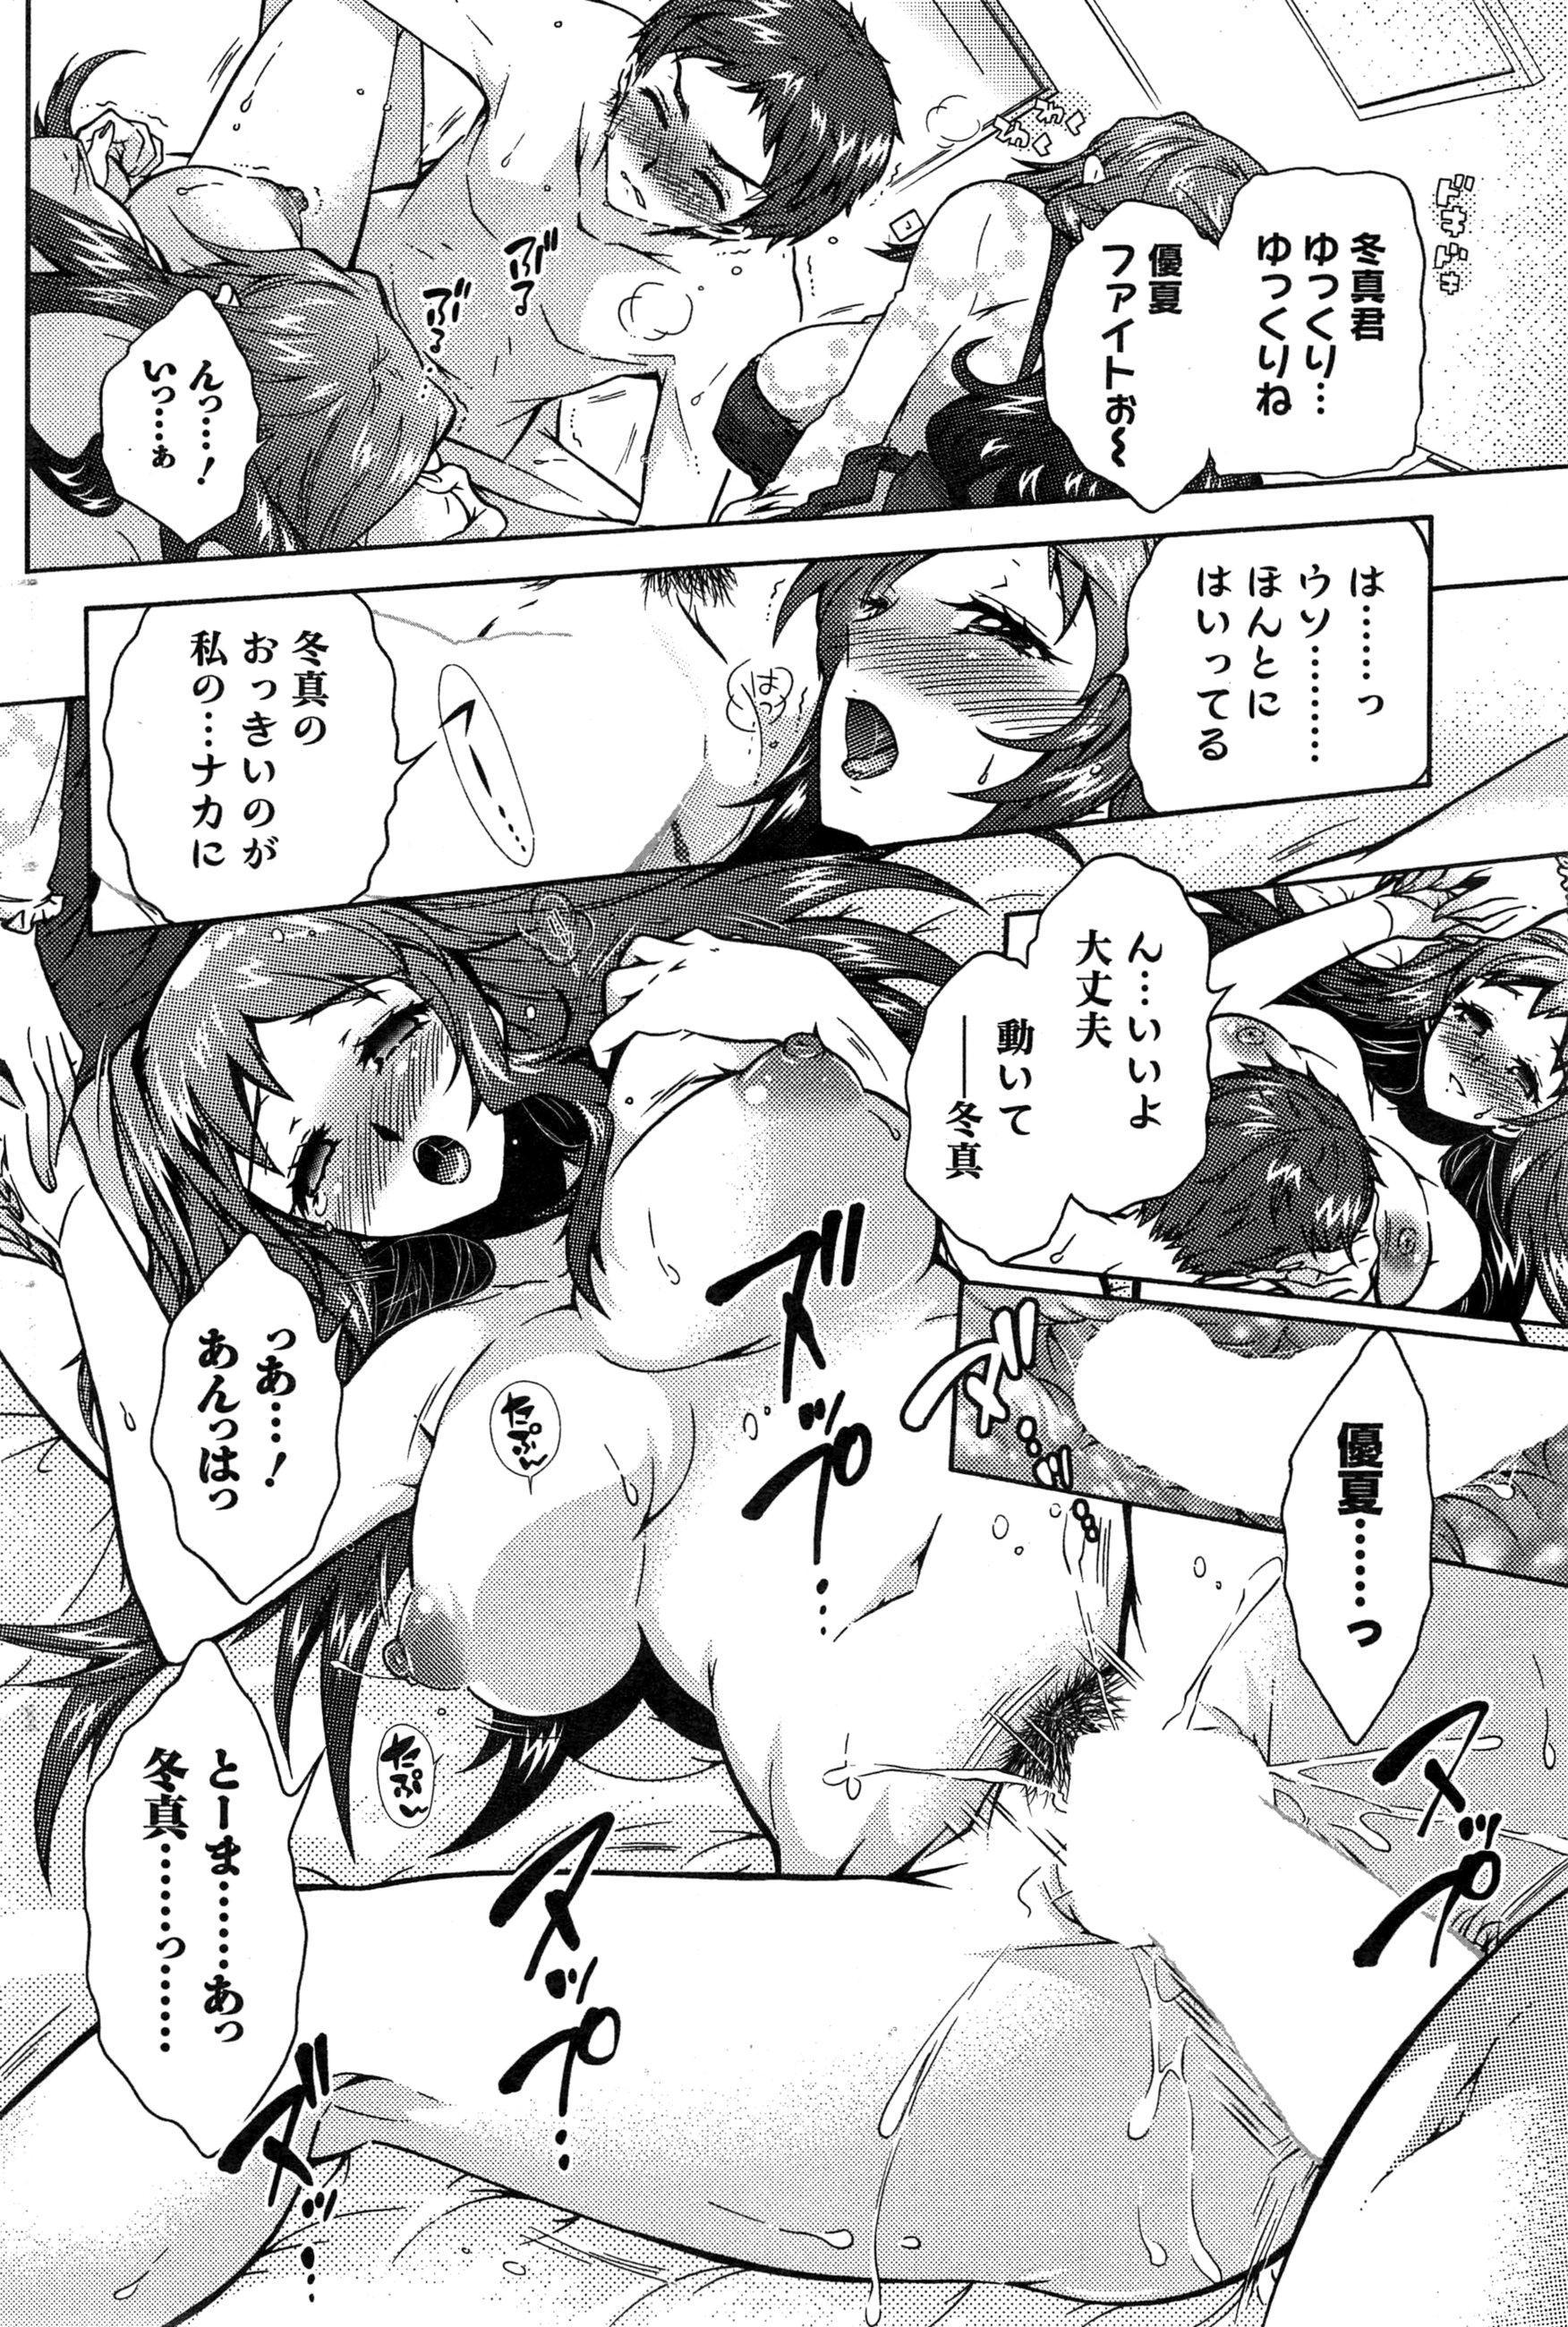 [Honda Arima] Sanshimai no Omocha - The Slave of Three Sisters Ch. 1-6 90